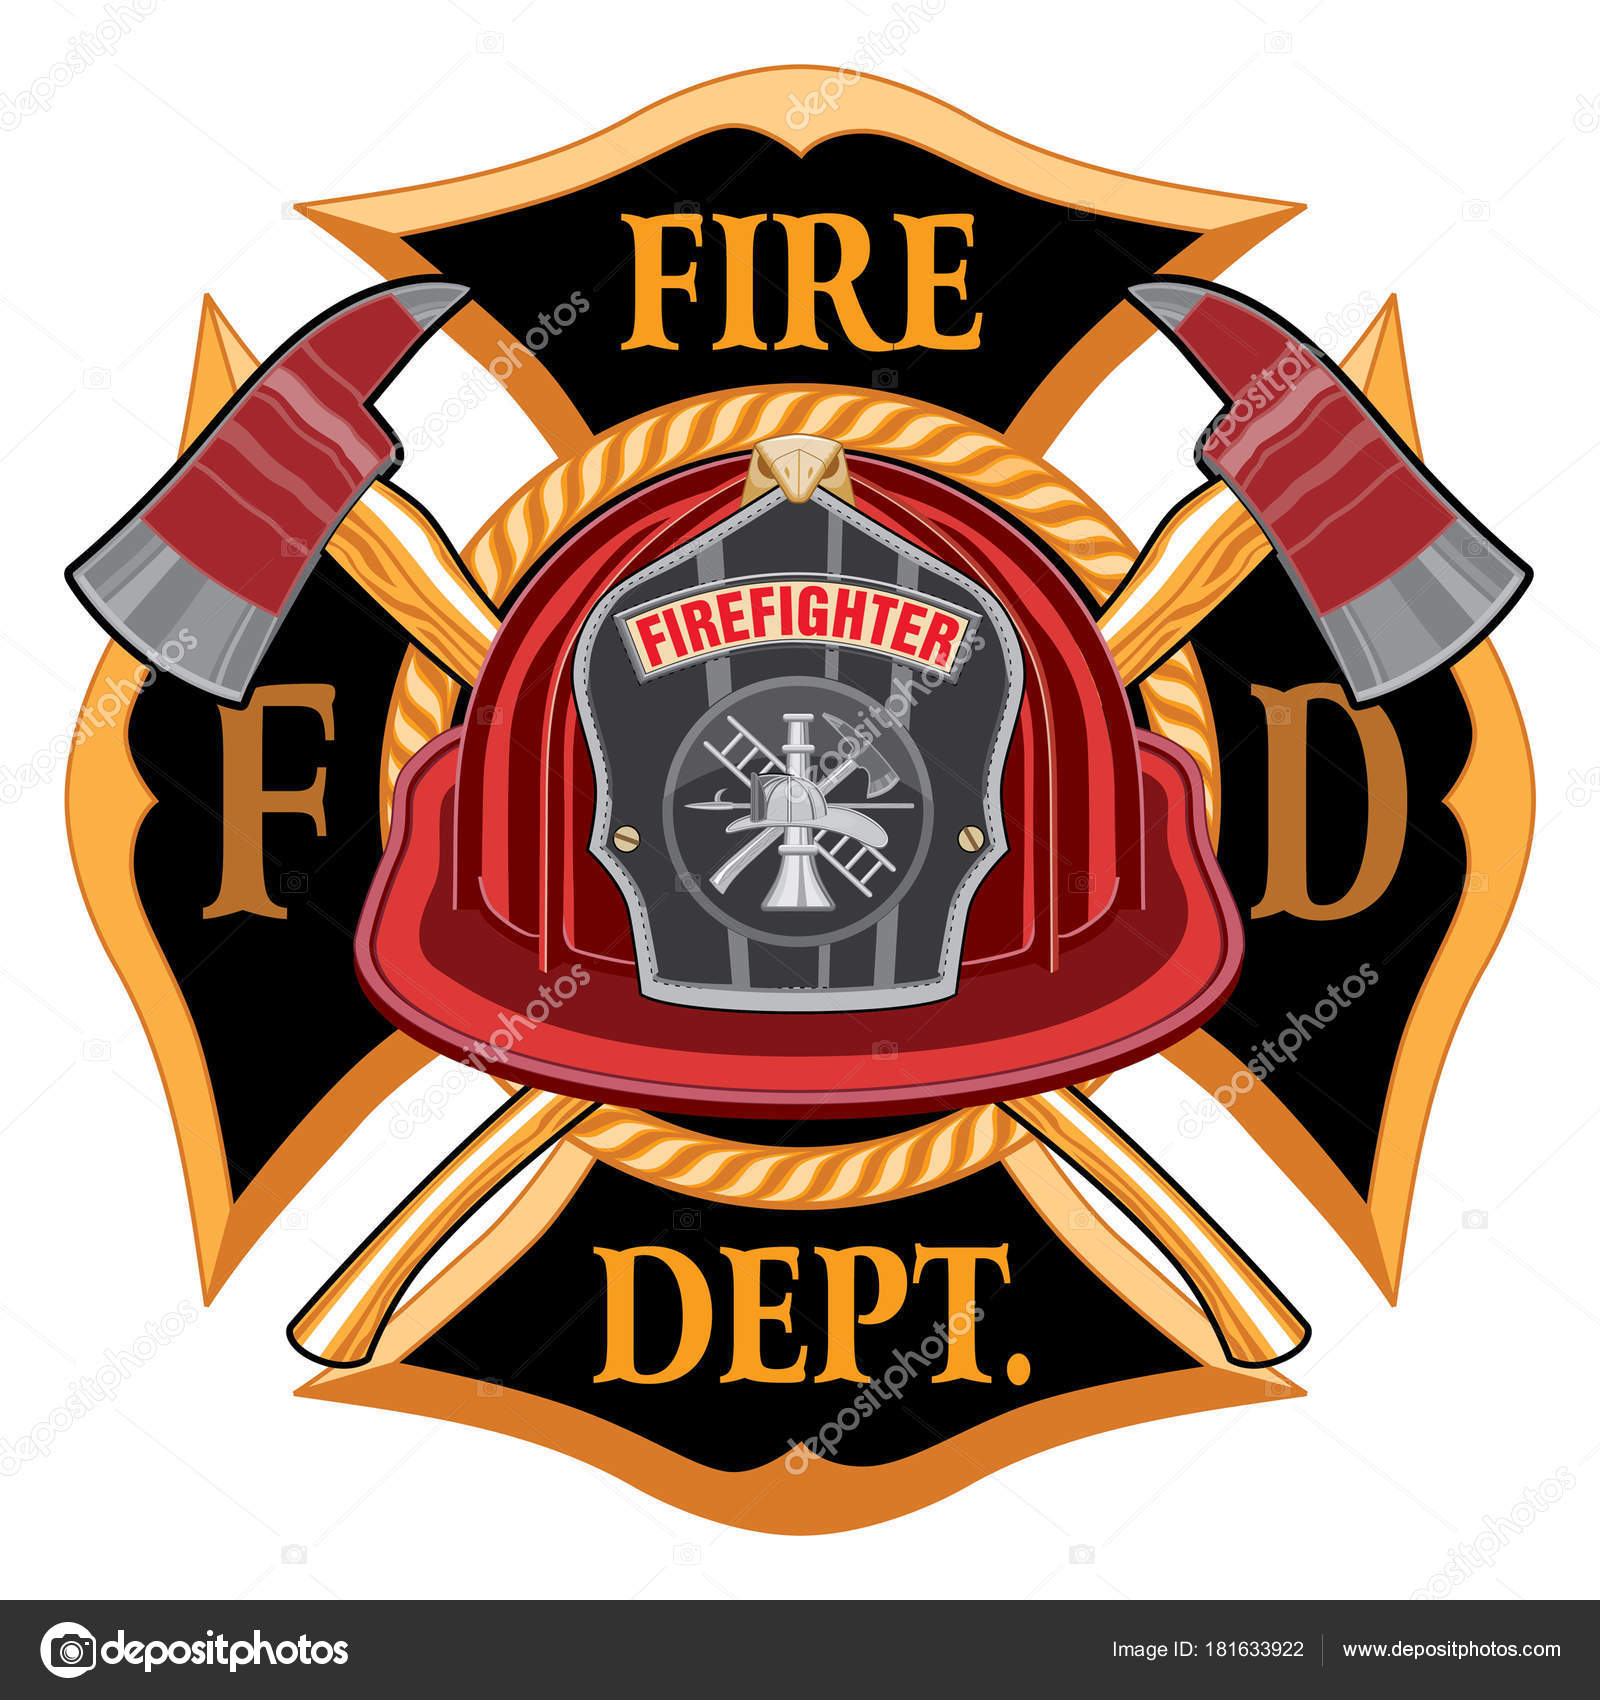 fire department cross vintage red helmet axes illustration vintage